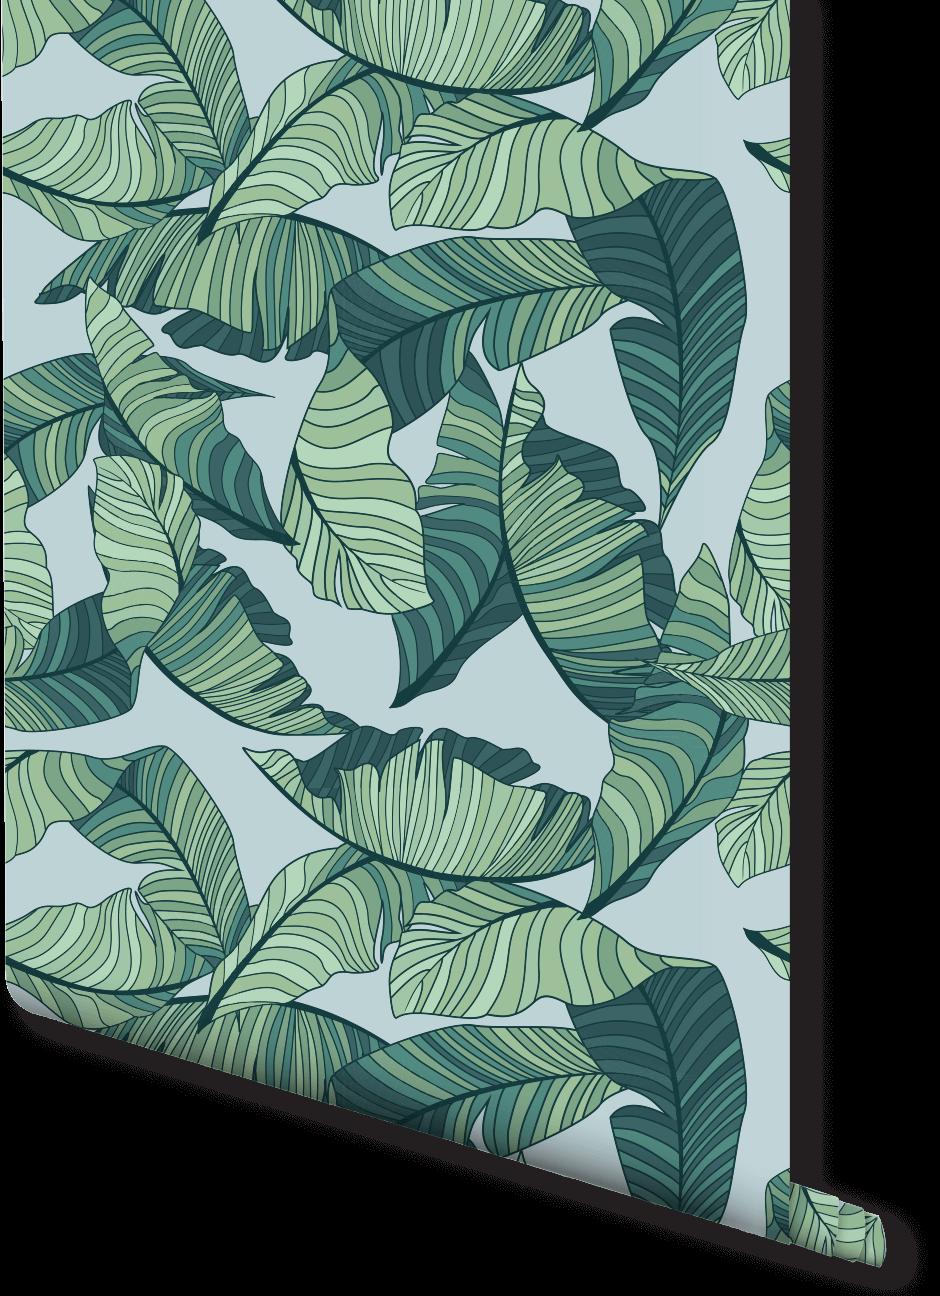 Illustrative Banana Leaf Wallpaper | Milexa